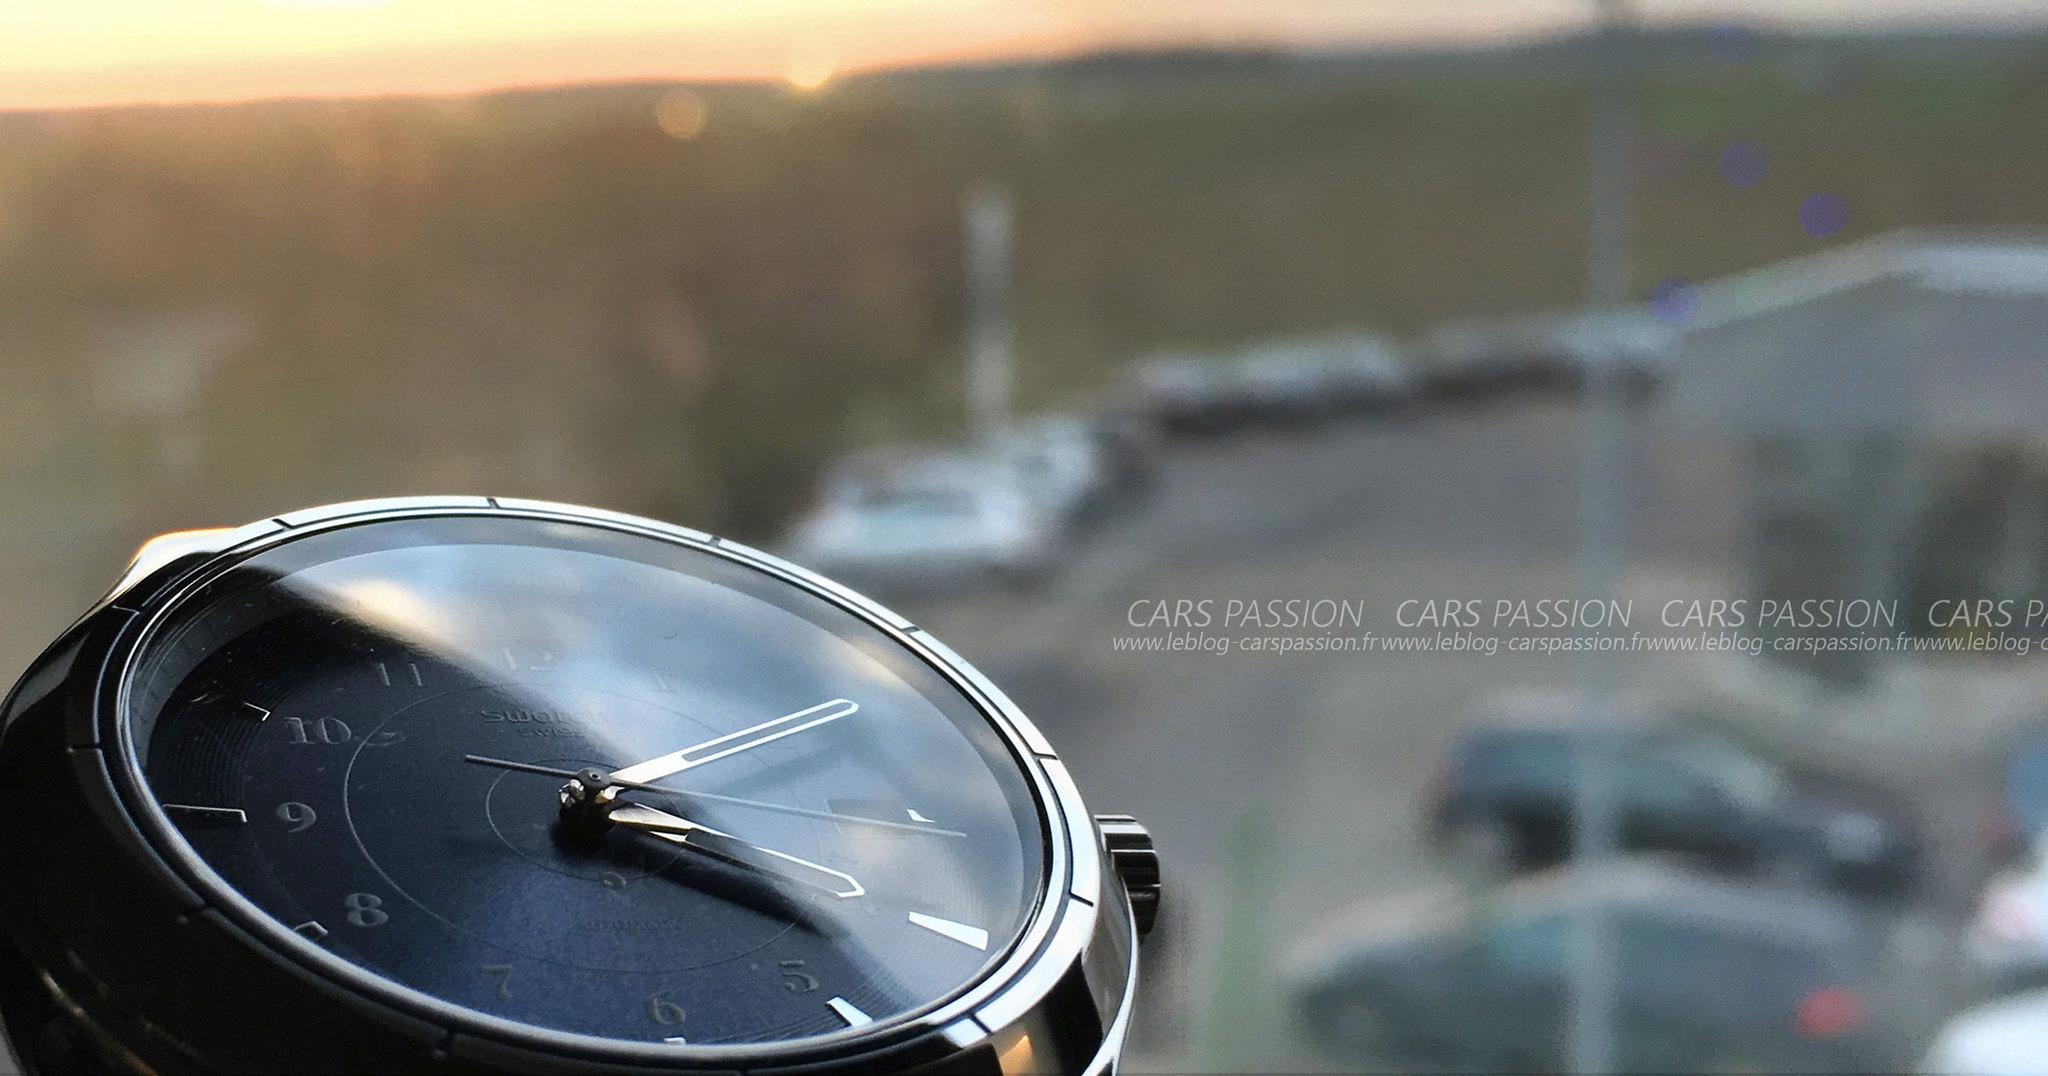 montres-automatique-swatch-sistem51-irony-fly-8